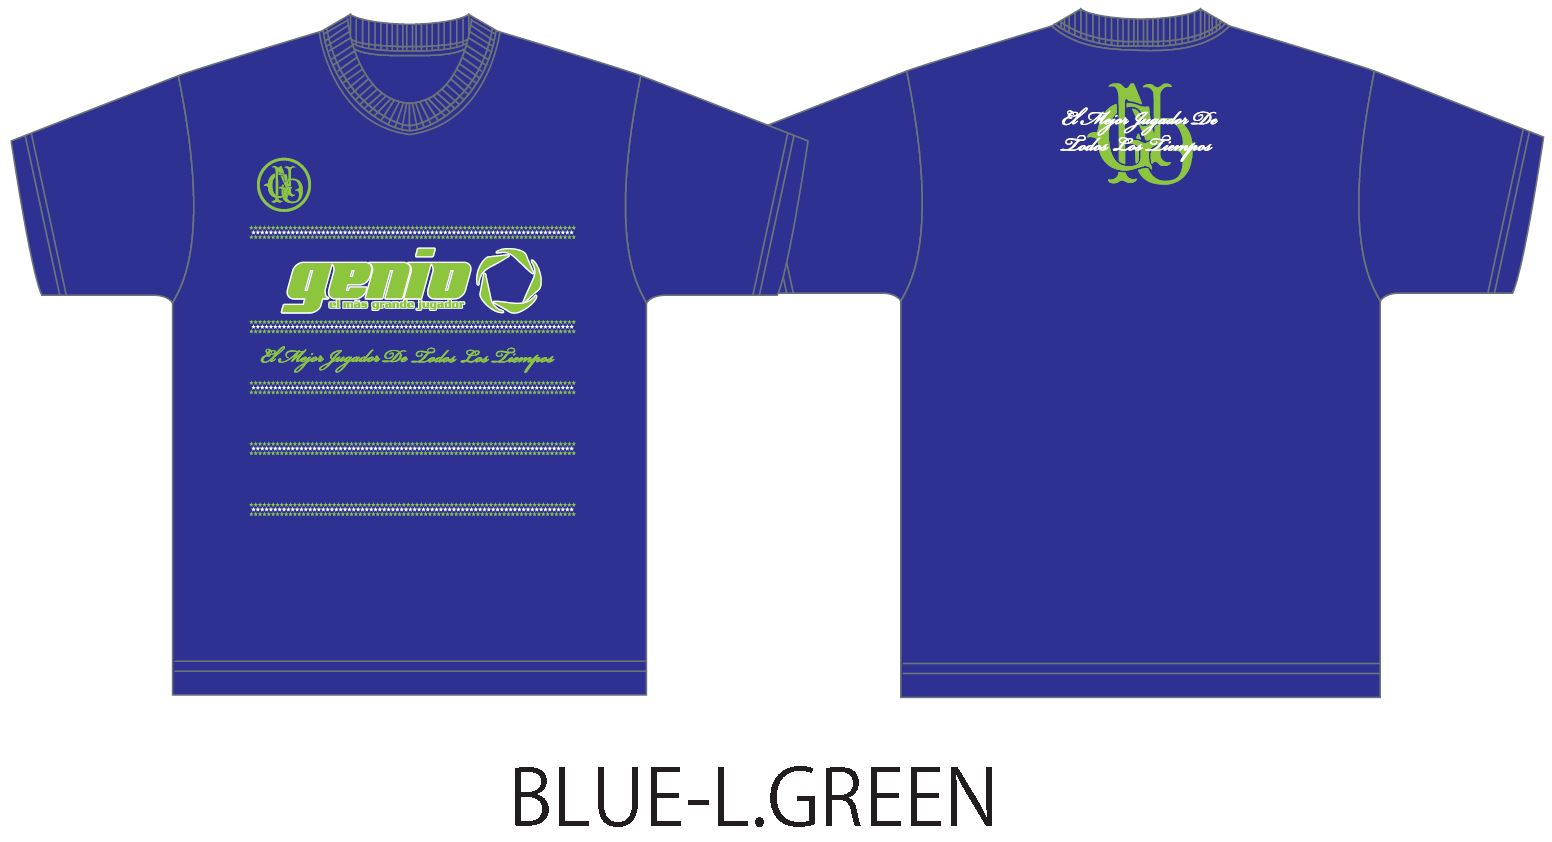 G14-SS-009-7-【GENIO-LOGO】--Dry-Shirts.jpg